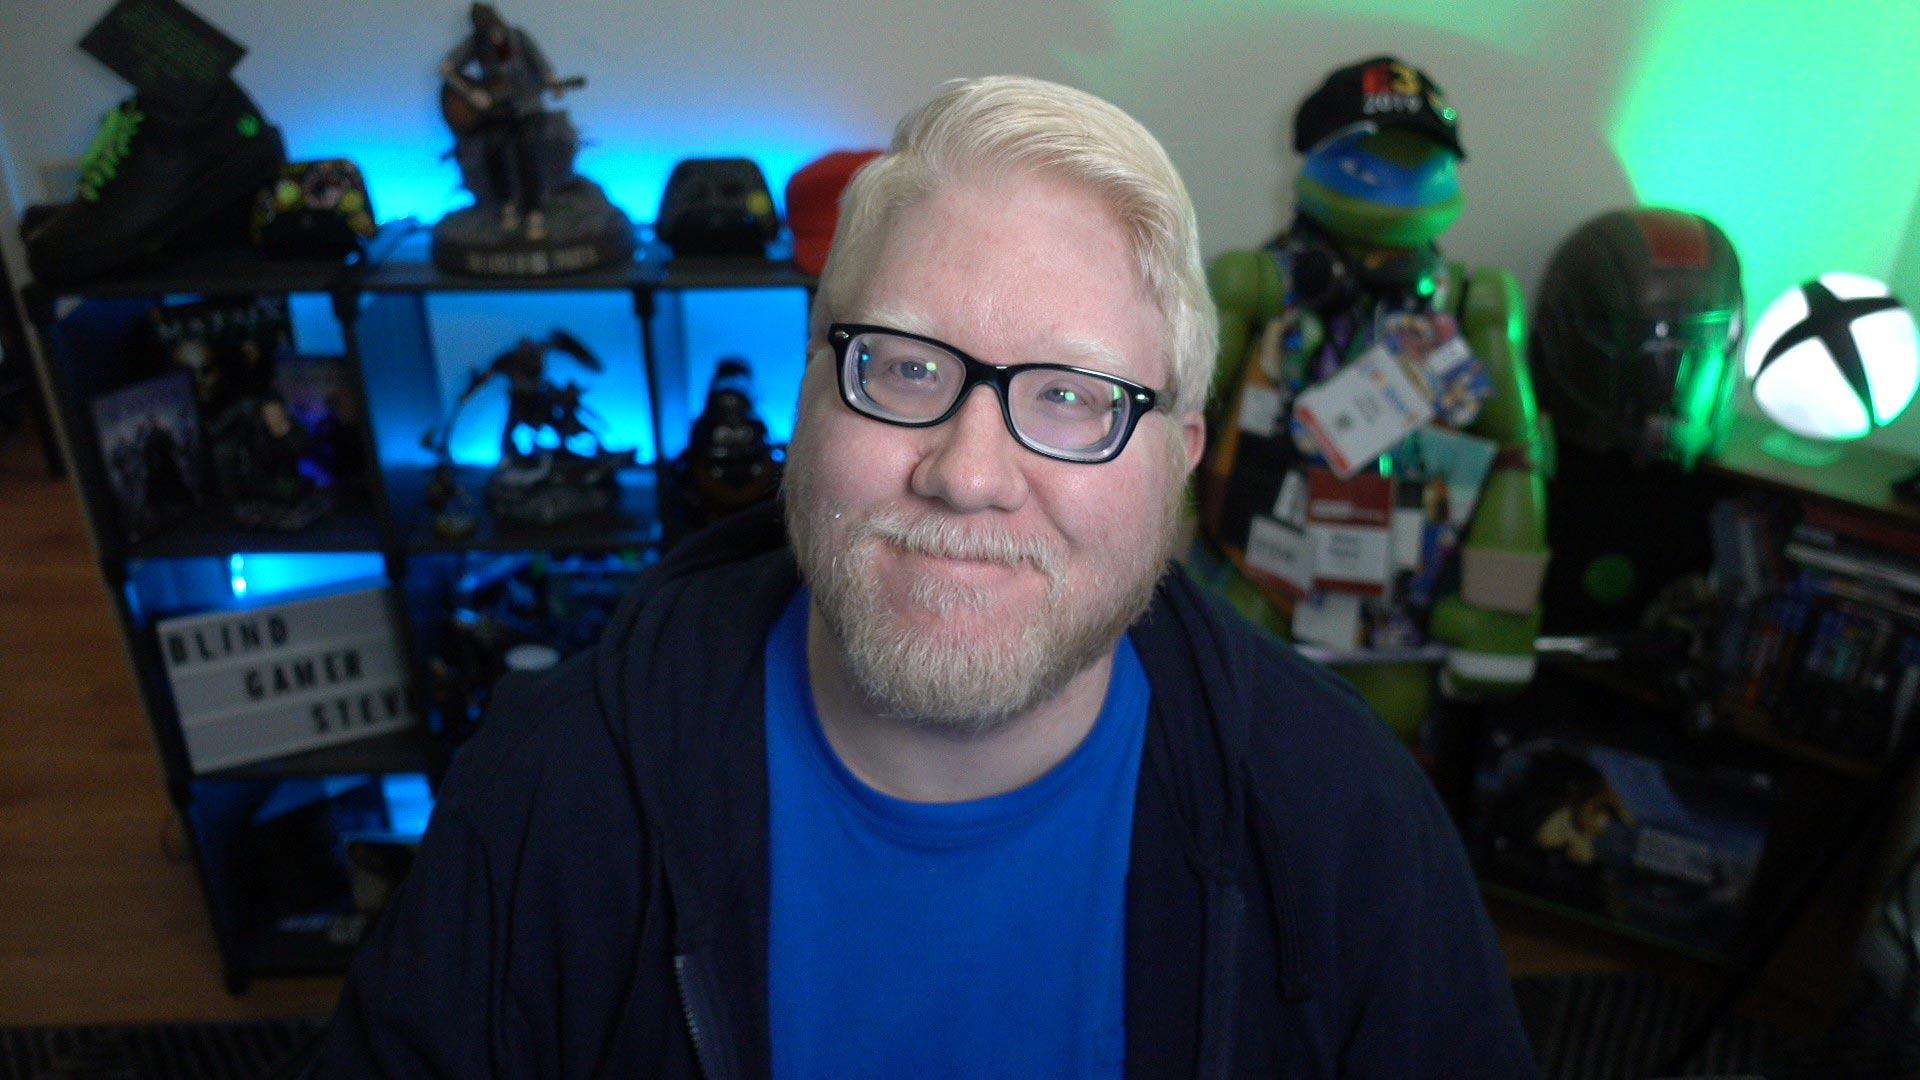 Steve Saylor in gaming room